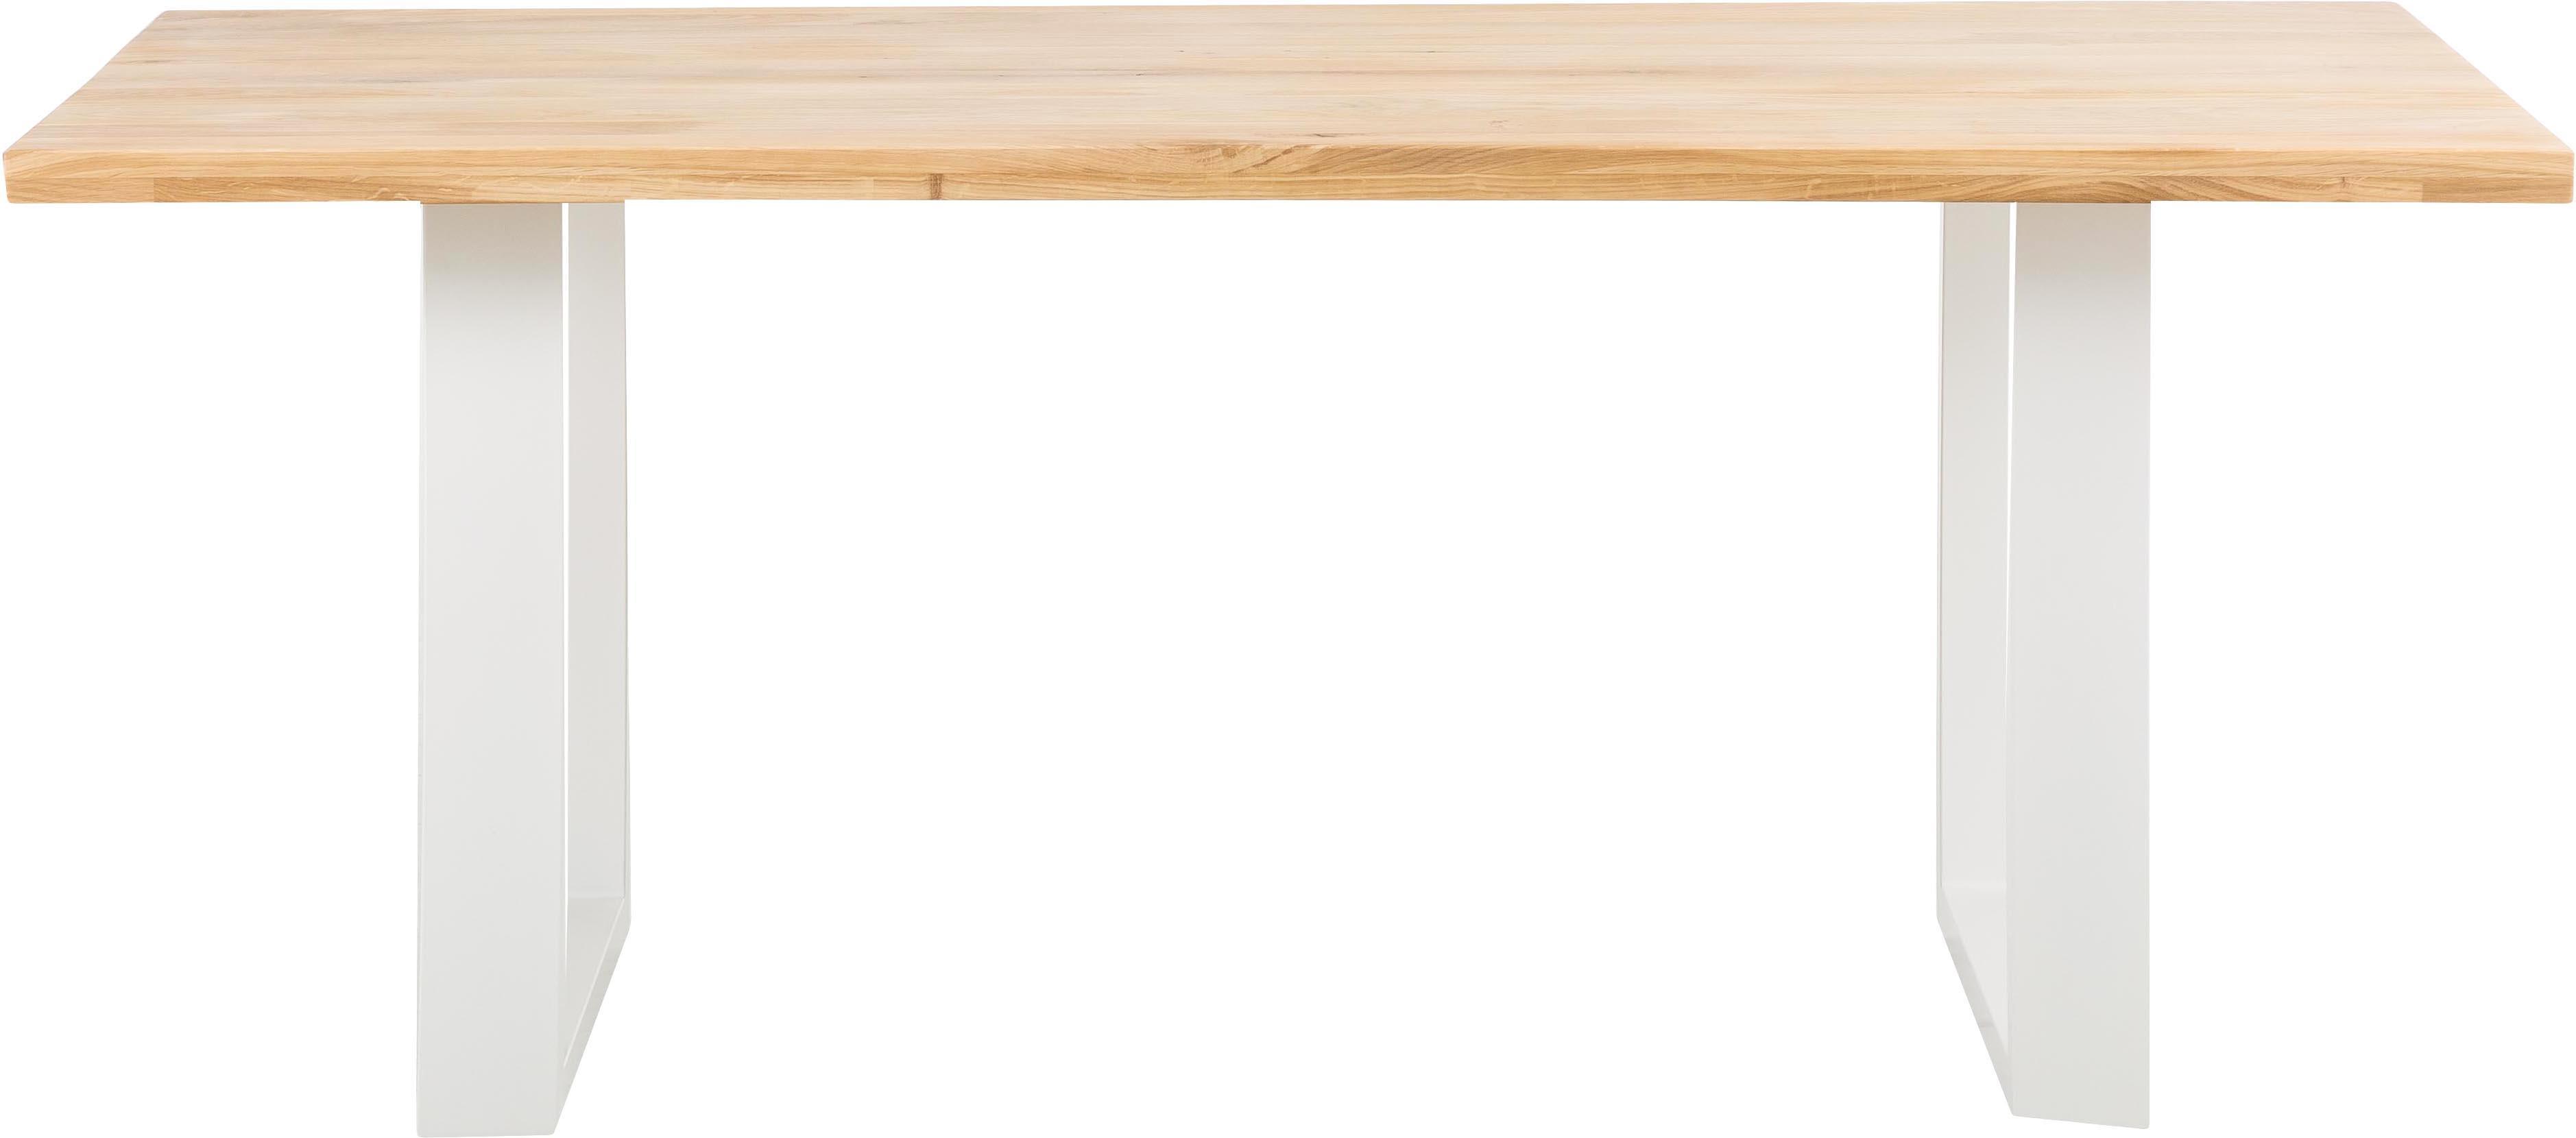 Mesa de comedor Oliver, tablero de madera maciza, Tablero: madera de roble silvestre, Patas: acero mate lacado, Roble, blanco, An 180 x F 90 cm